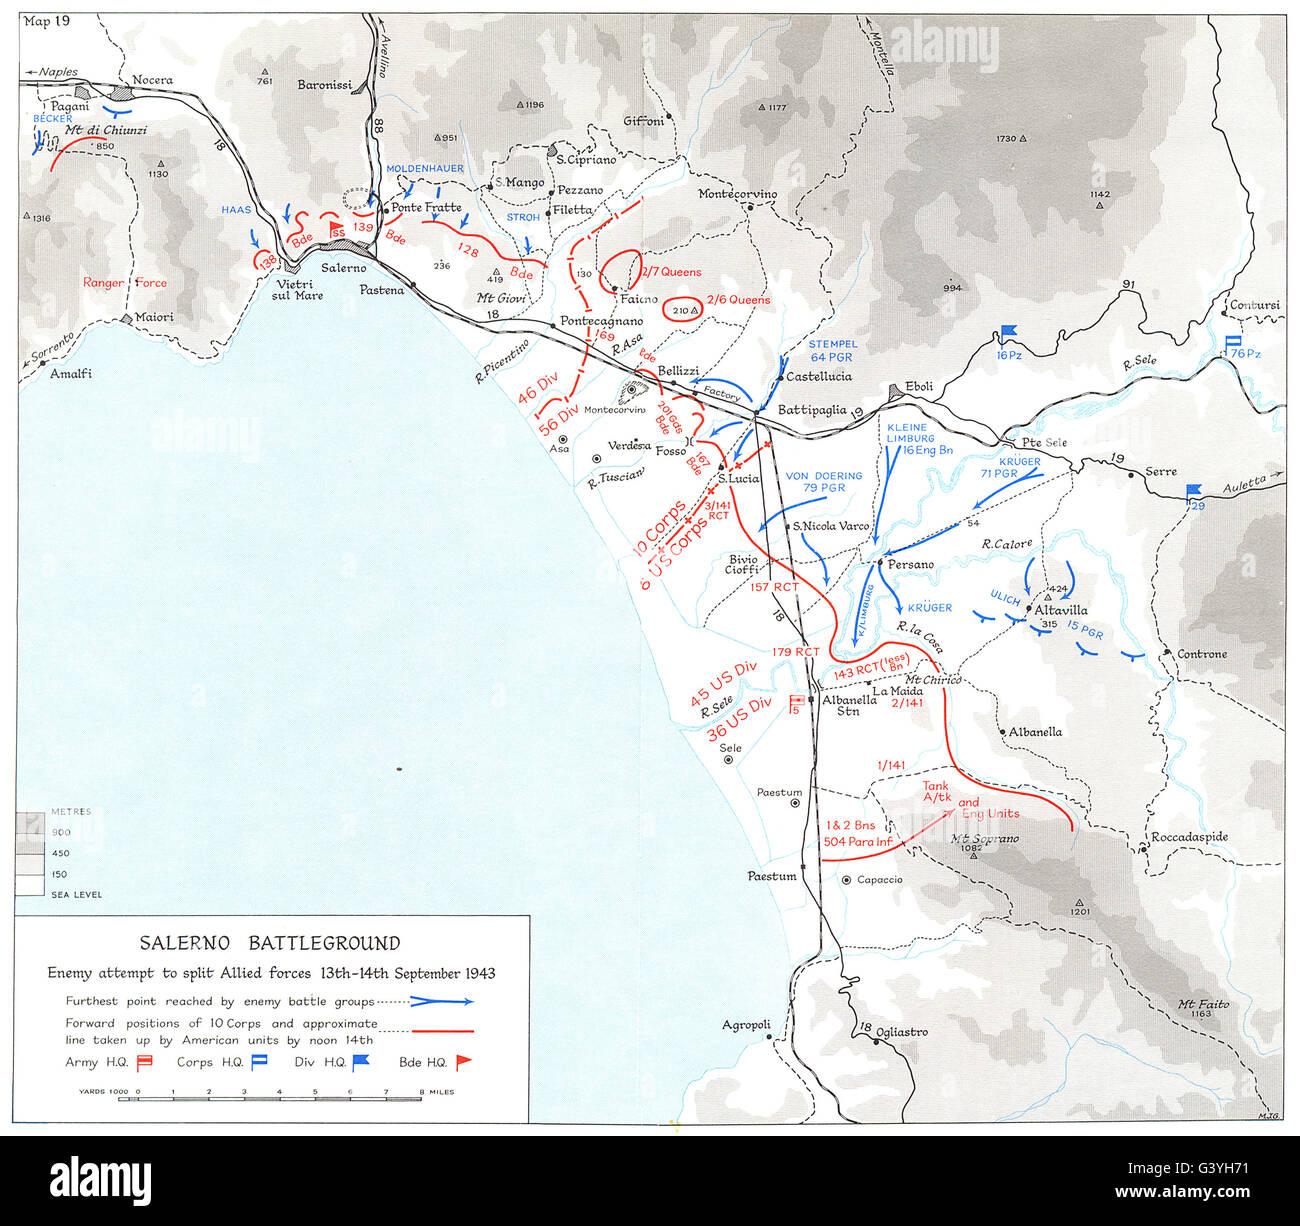 ITALY: Battle Salerno Beachhead (9th to 16th Sep 1943) : Battleground, 1973 map - Stock Image